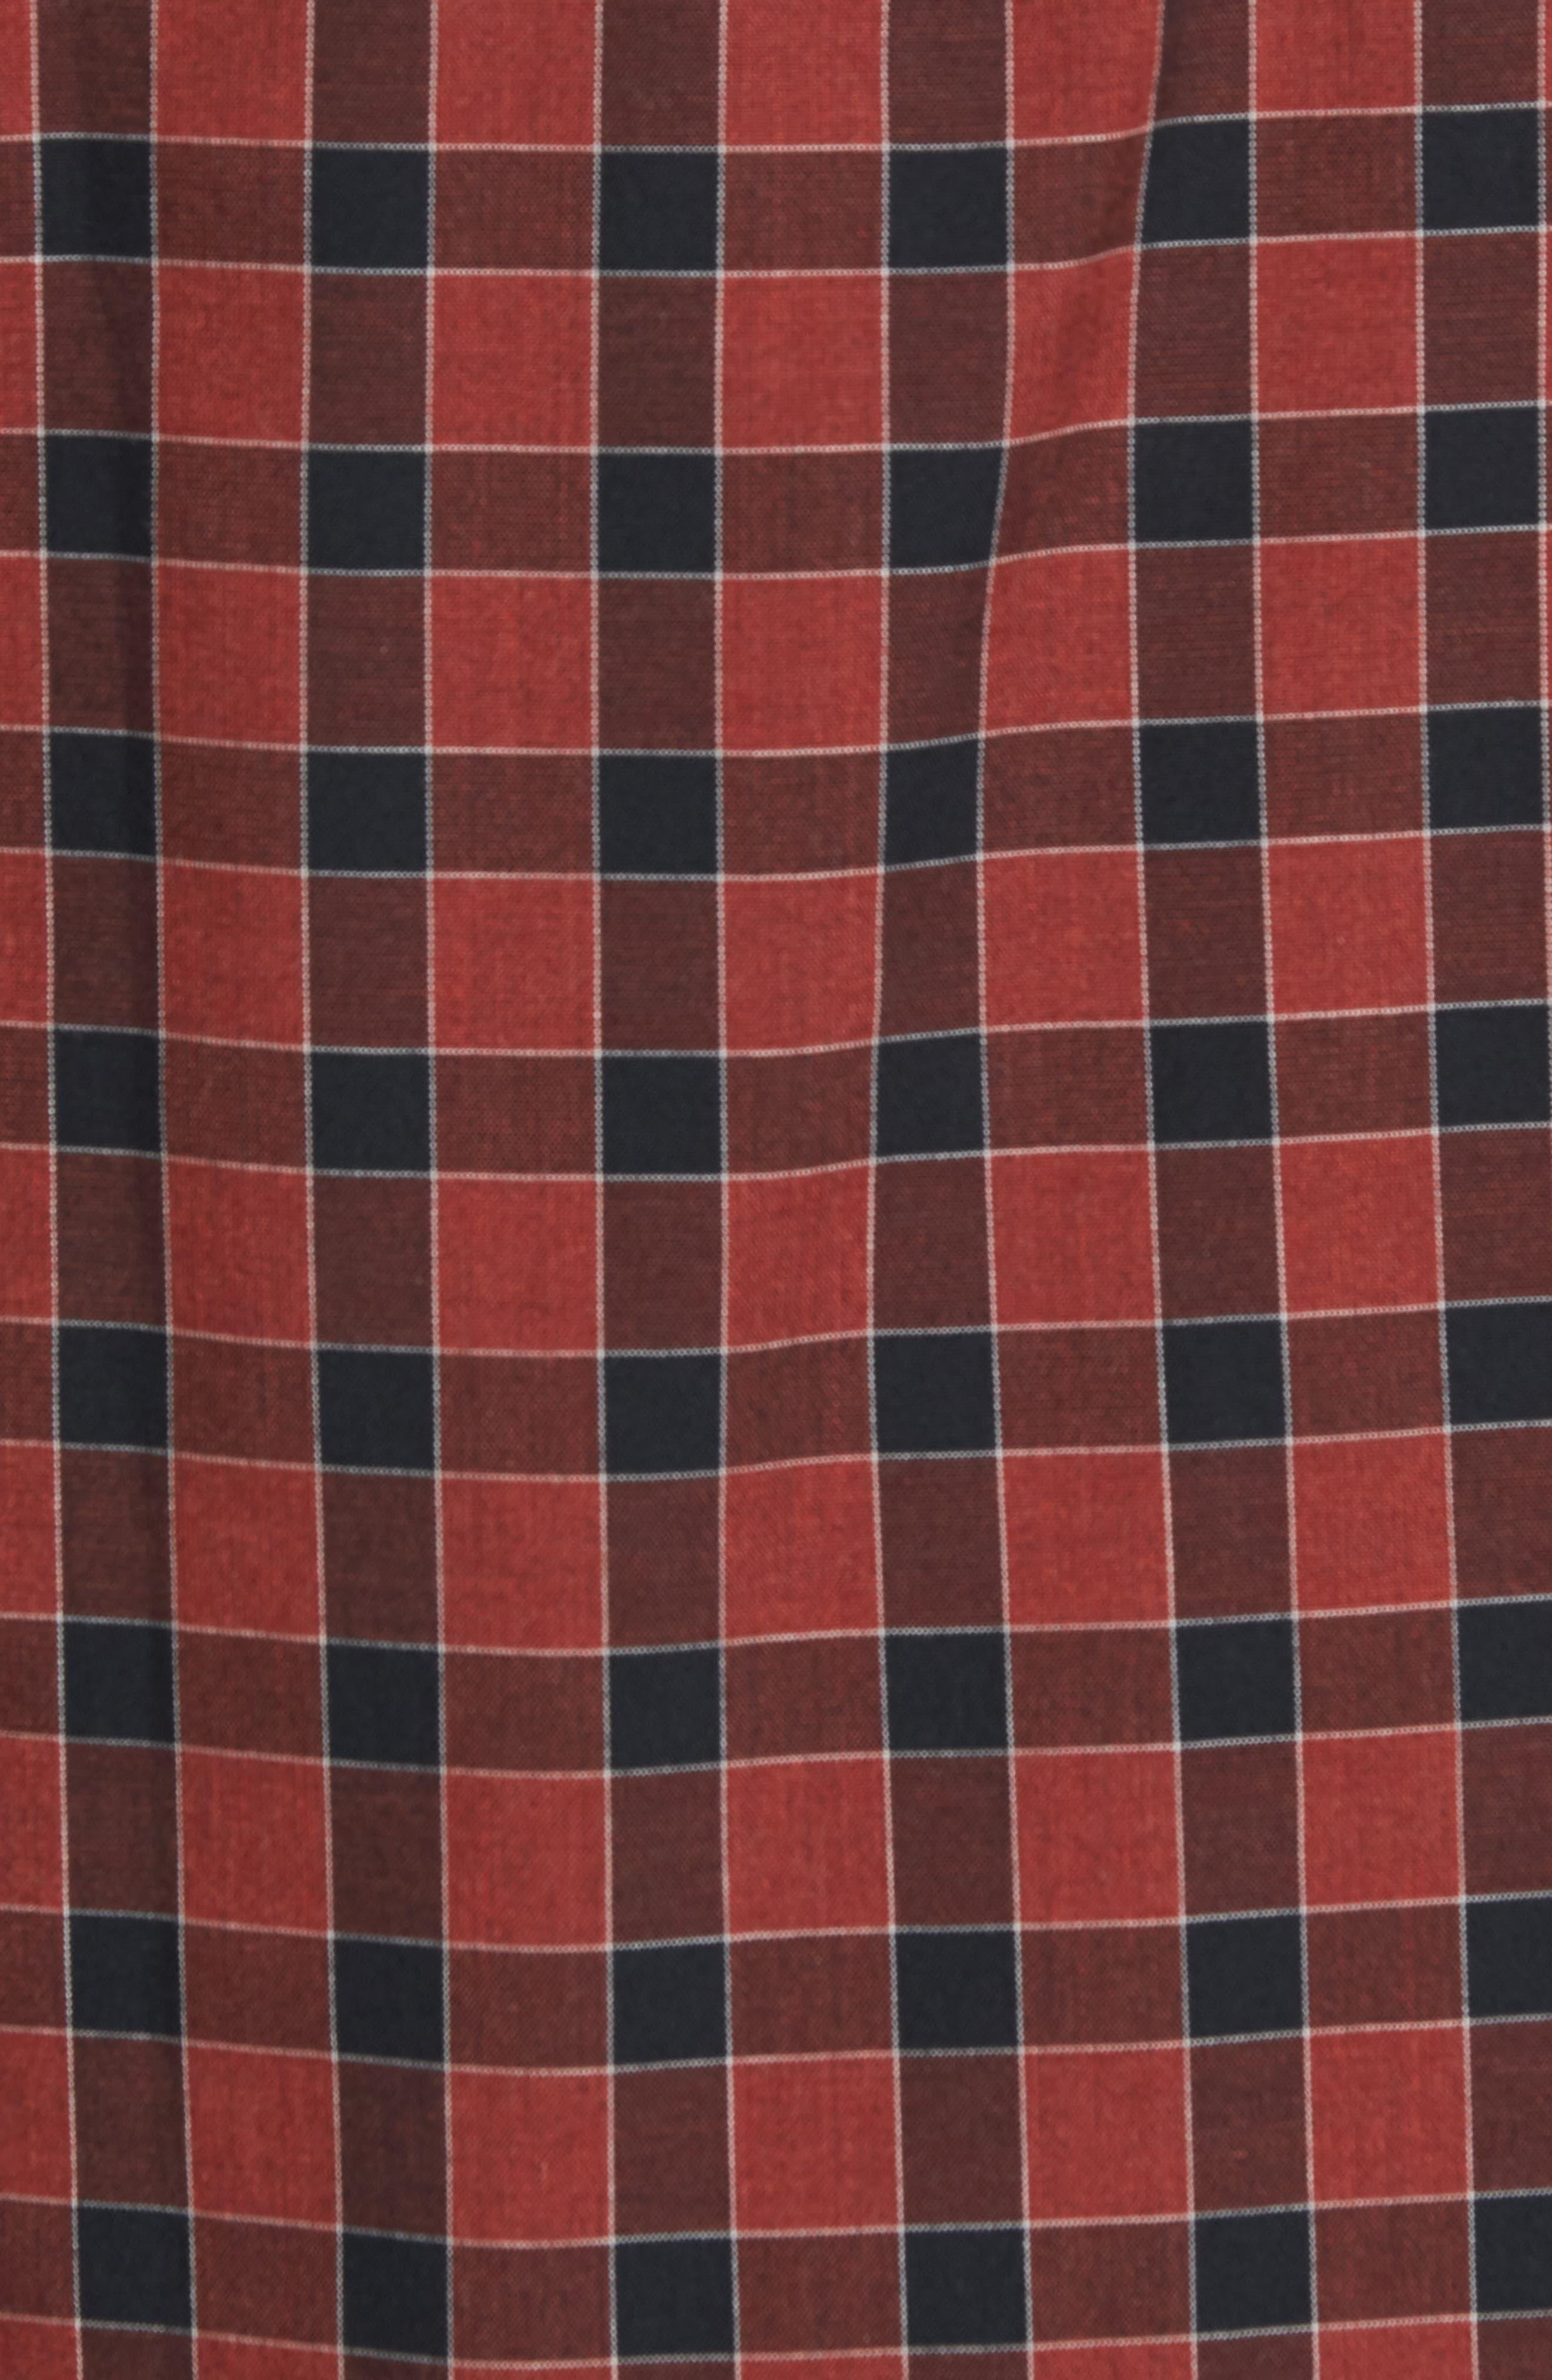 Lake Plaid Flannel Shirt,                             Alternate thumbnail 5, color,                             600